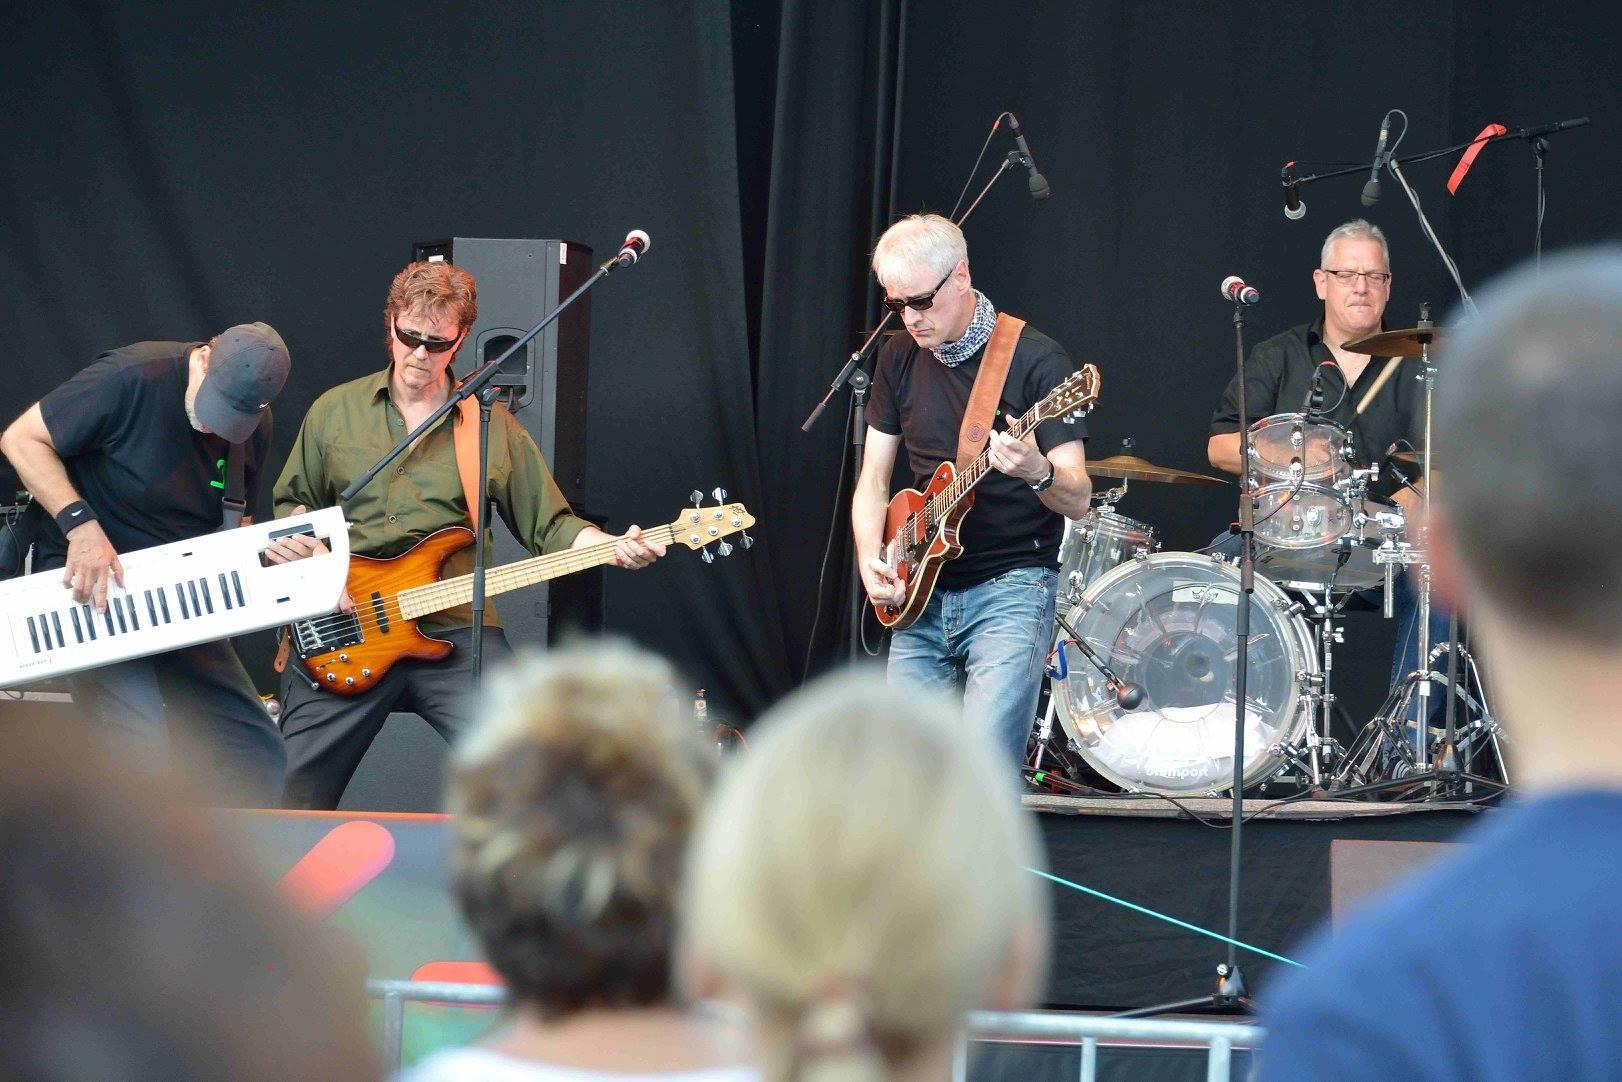 Alzenauer Stadtfest August 2016